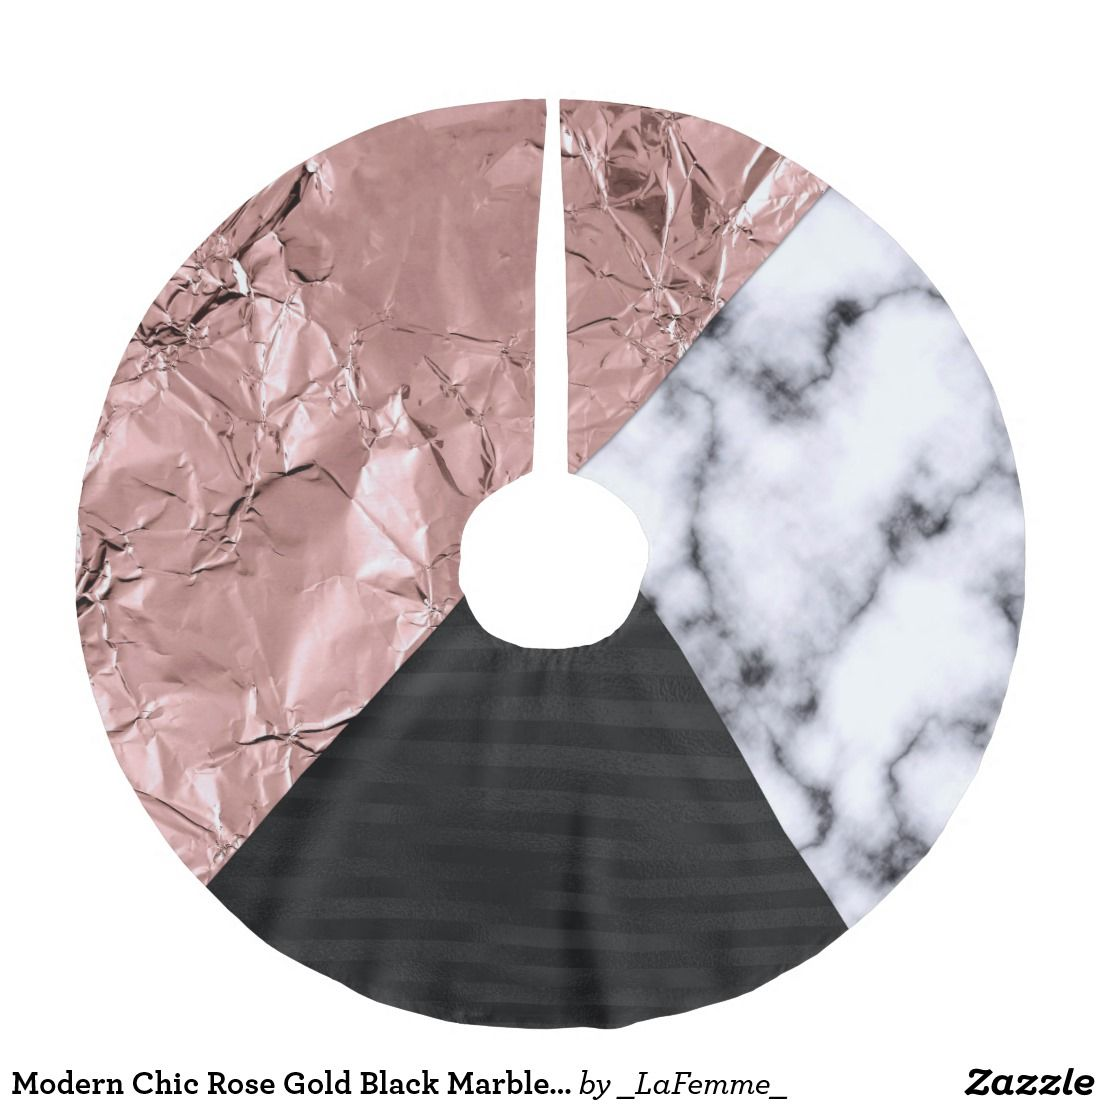 Modern Chic Rose Gold Black Marble Geometric Brushed Polyester Tree Skirt Gold Christmas Tree Skirt Christmas Tree Skirt Holiday Tree Skirts